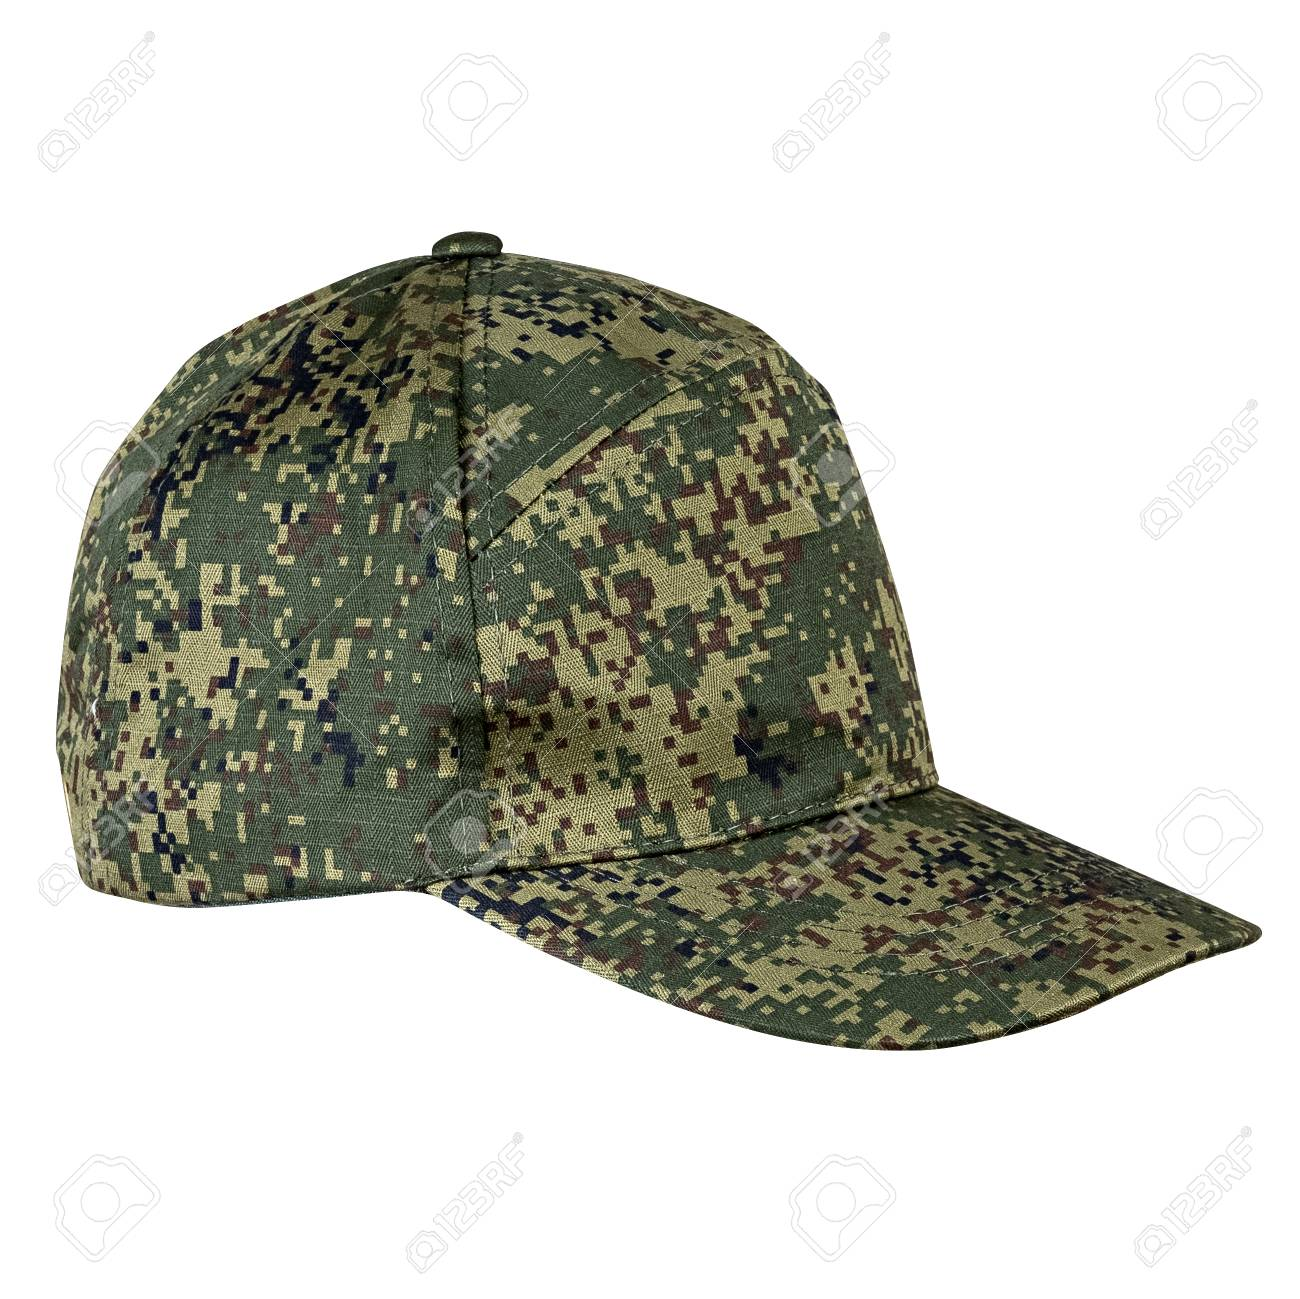 aa33aa4ad356db Military cap, khaki helmet, isolated white background Stock Photo - 75568243